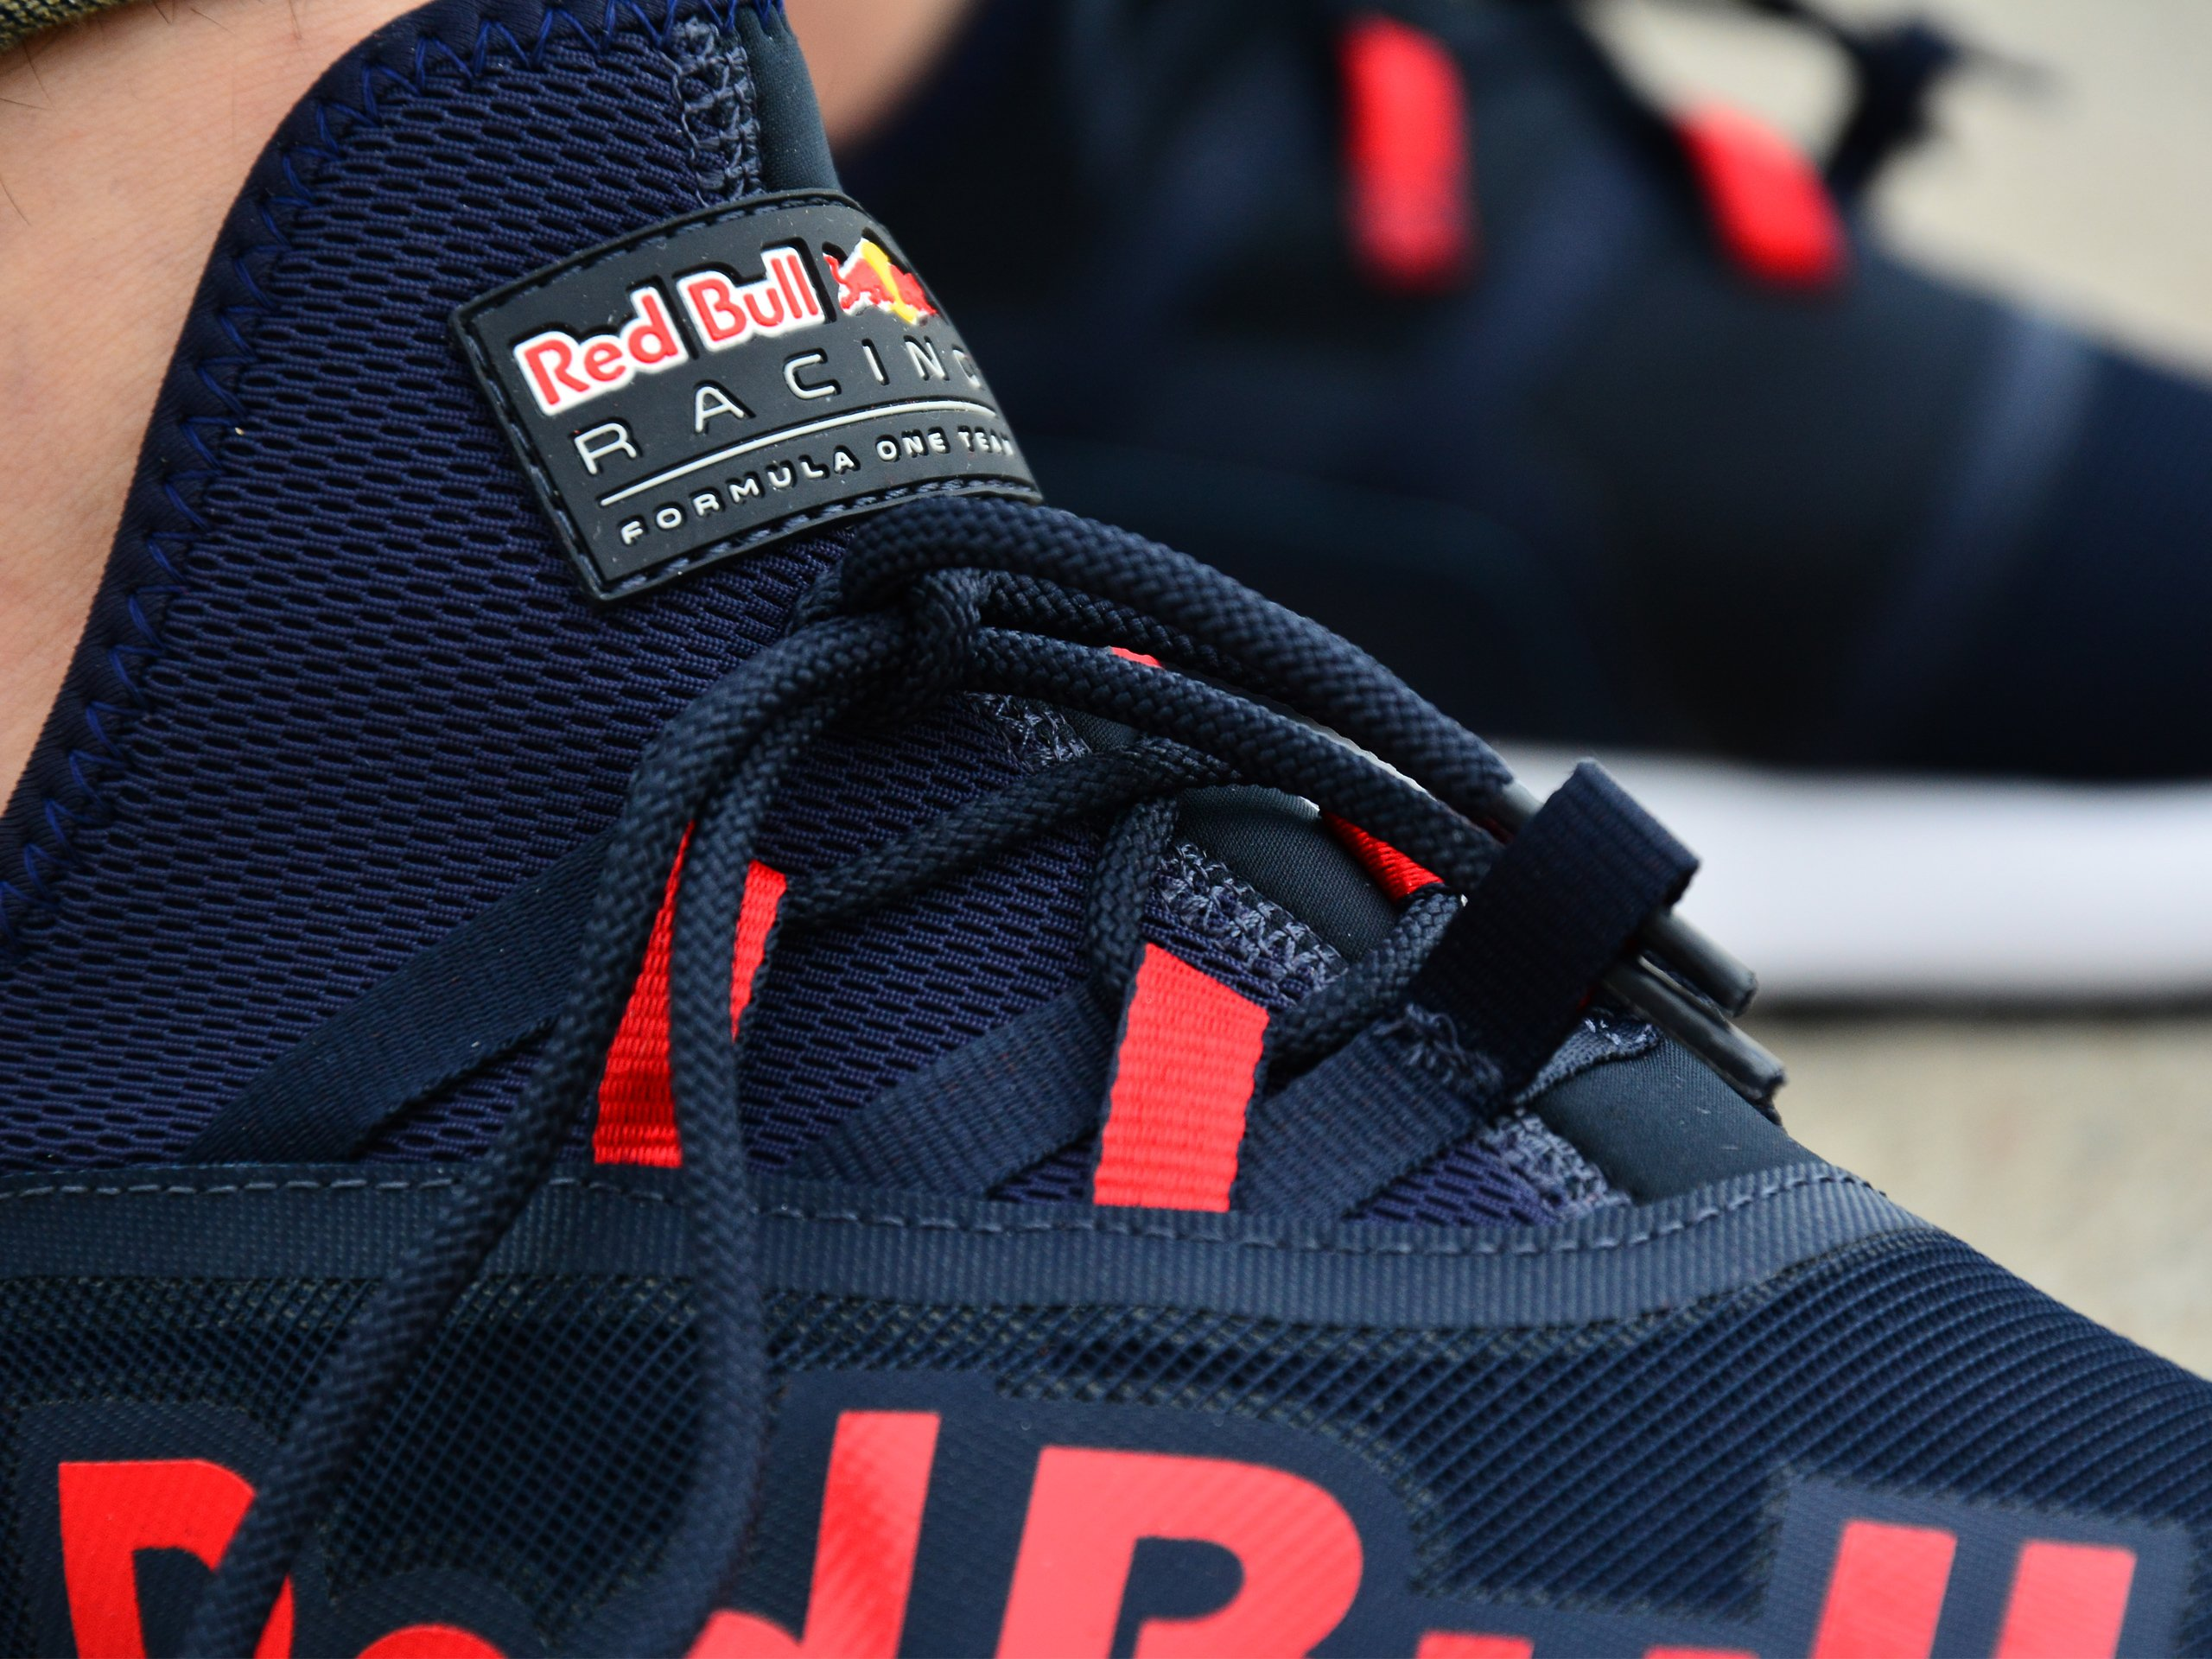 red bull racing evo cat ii sneakers